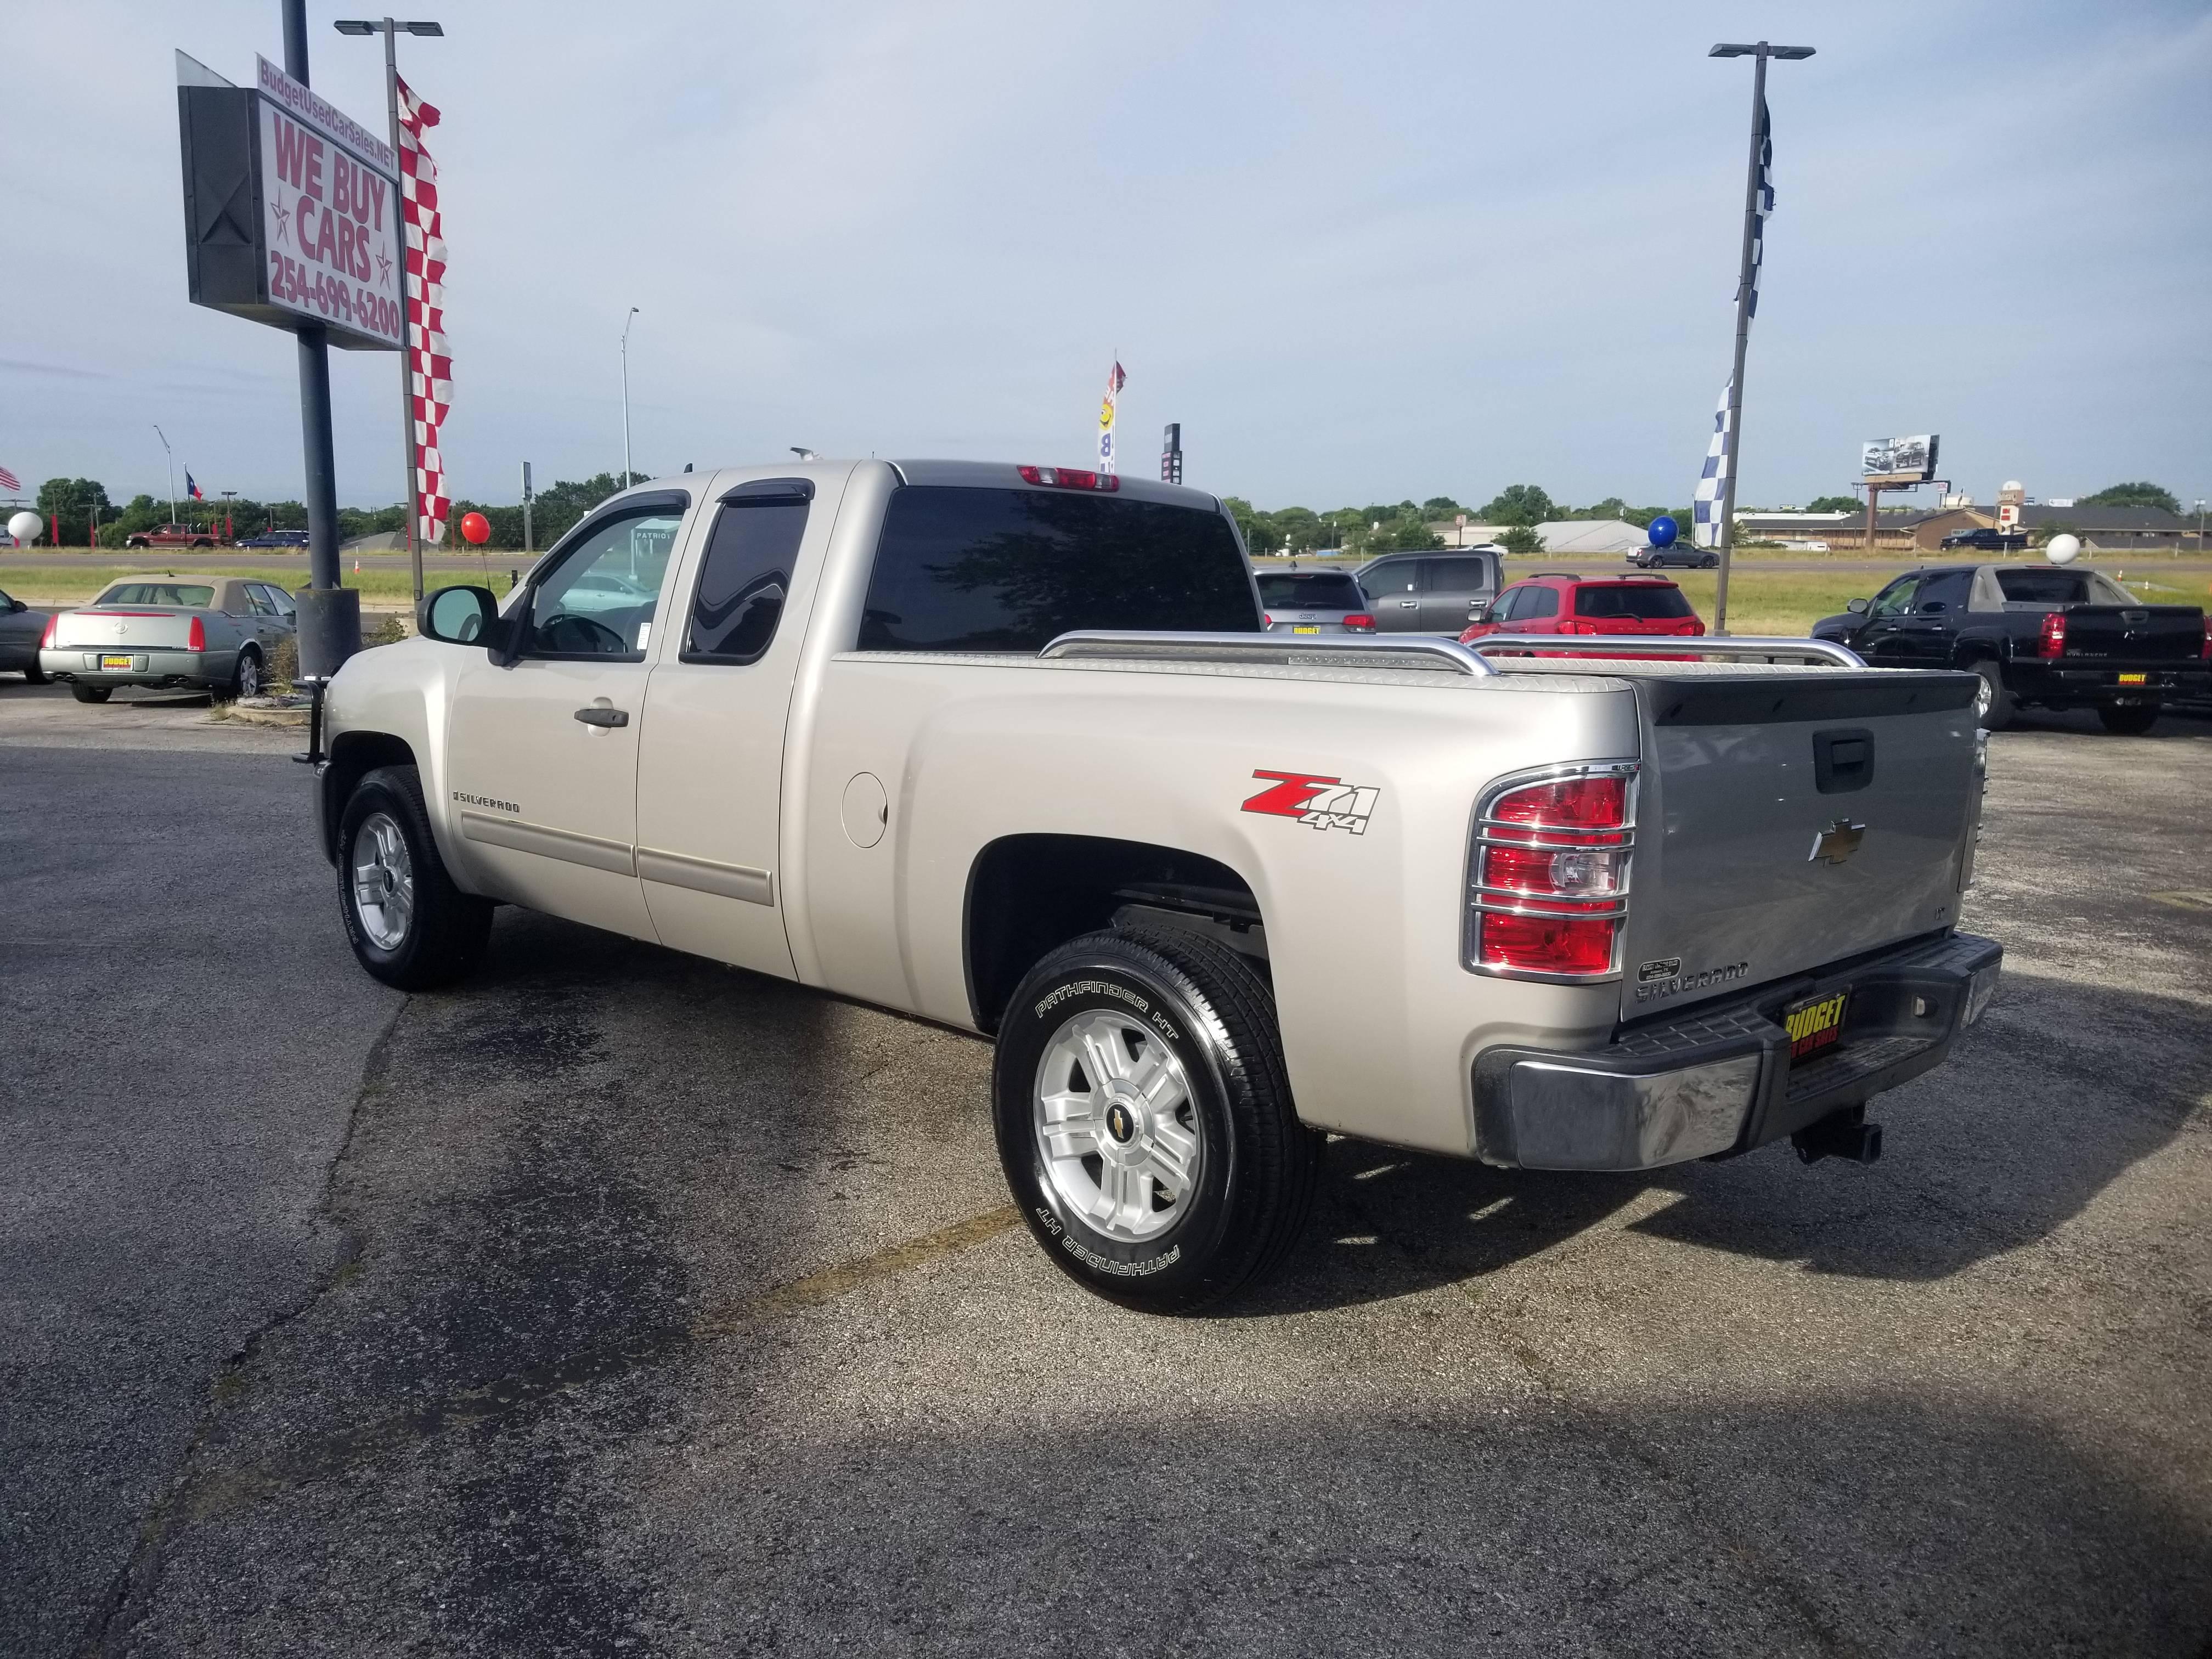 used vehicle - Truck Chevrolet Silverado 1500 2009